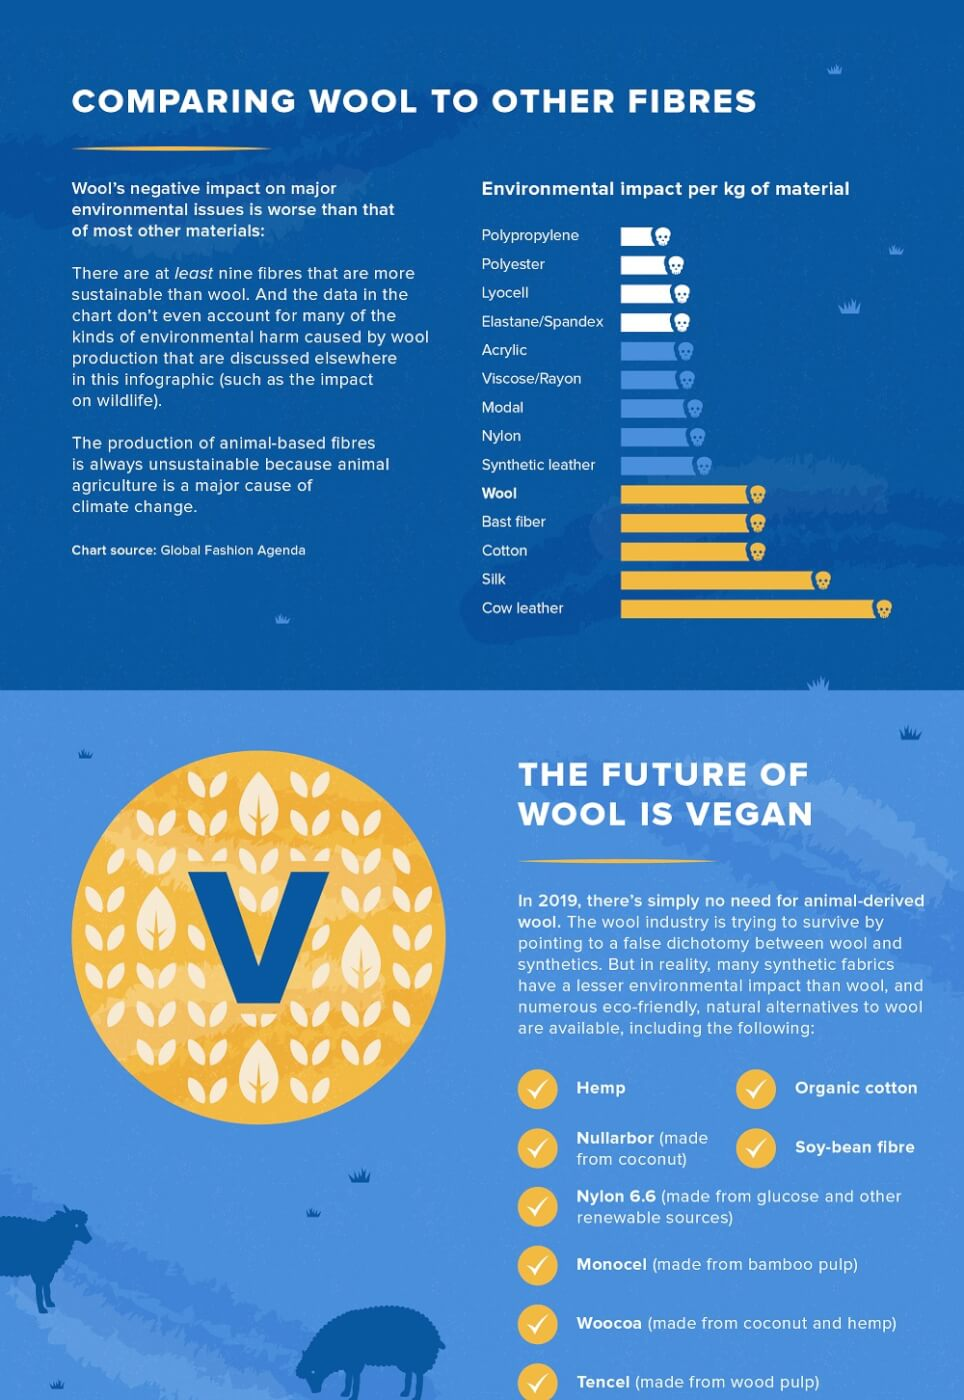 Wool, Vegan Wool and Fabrics